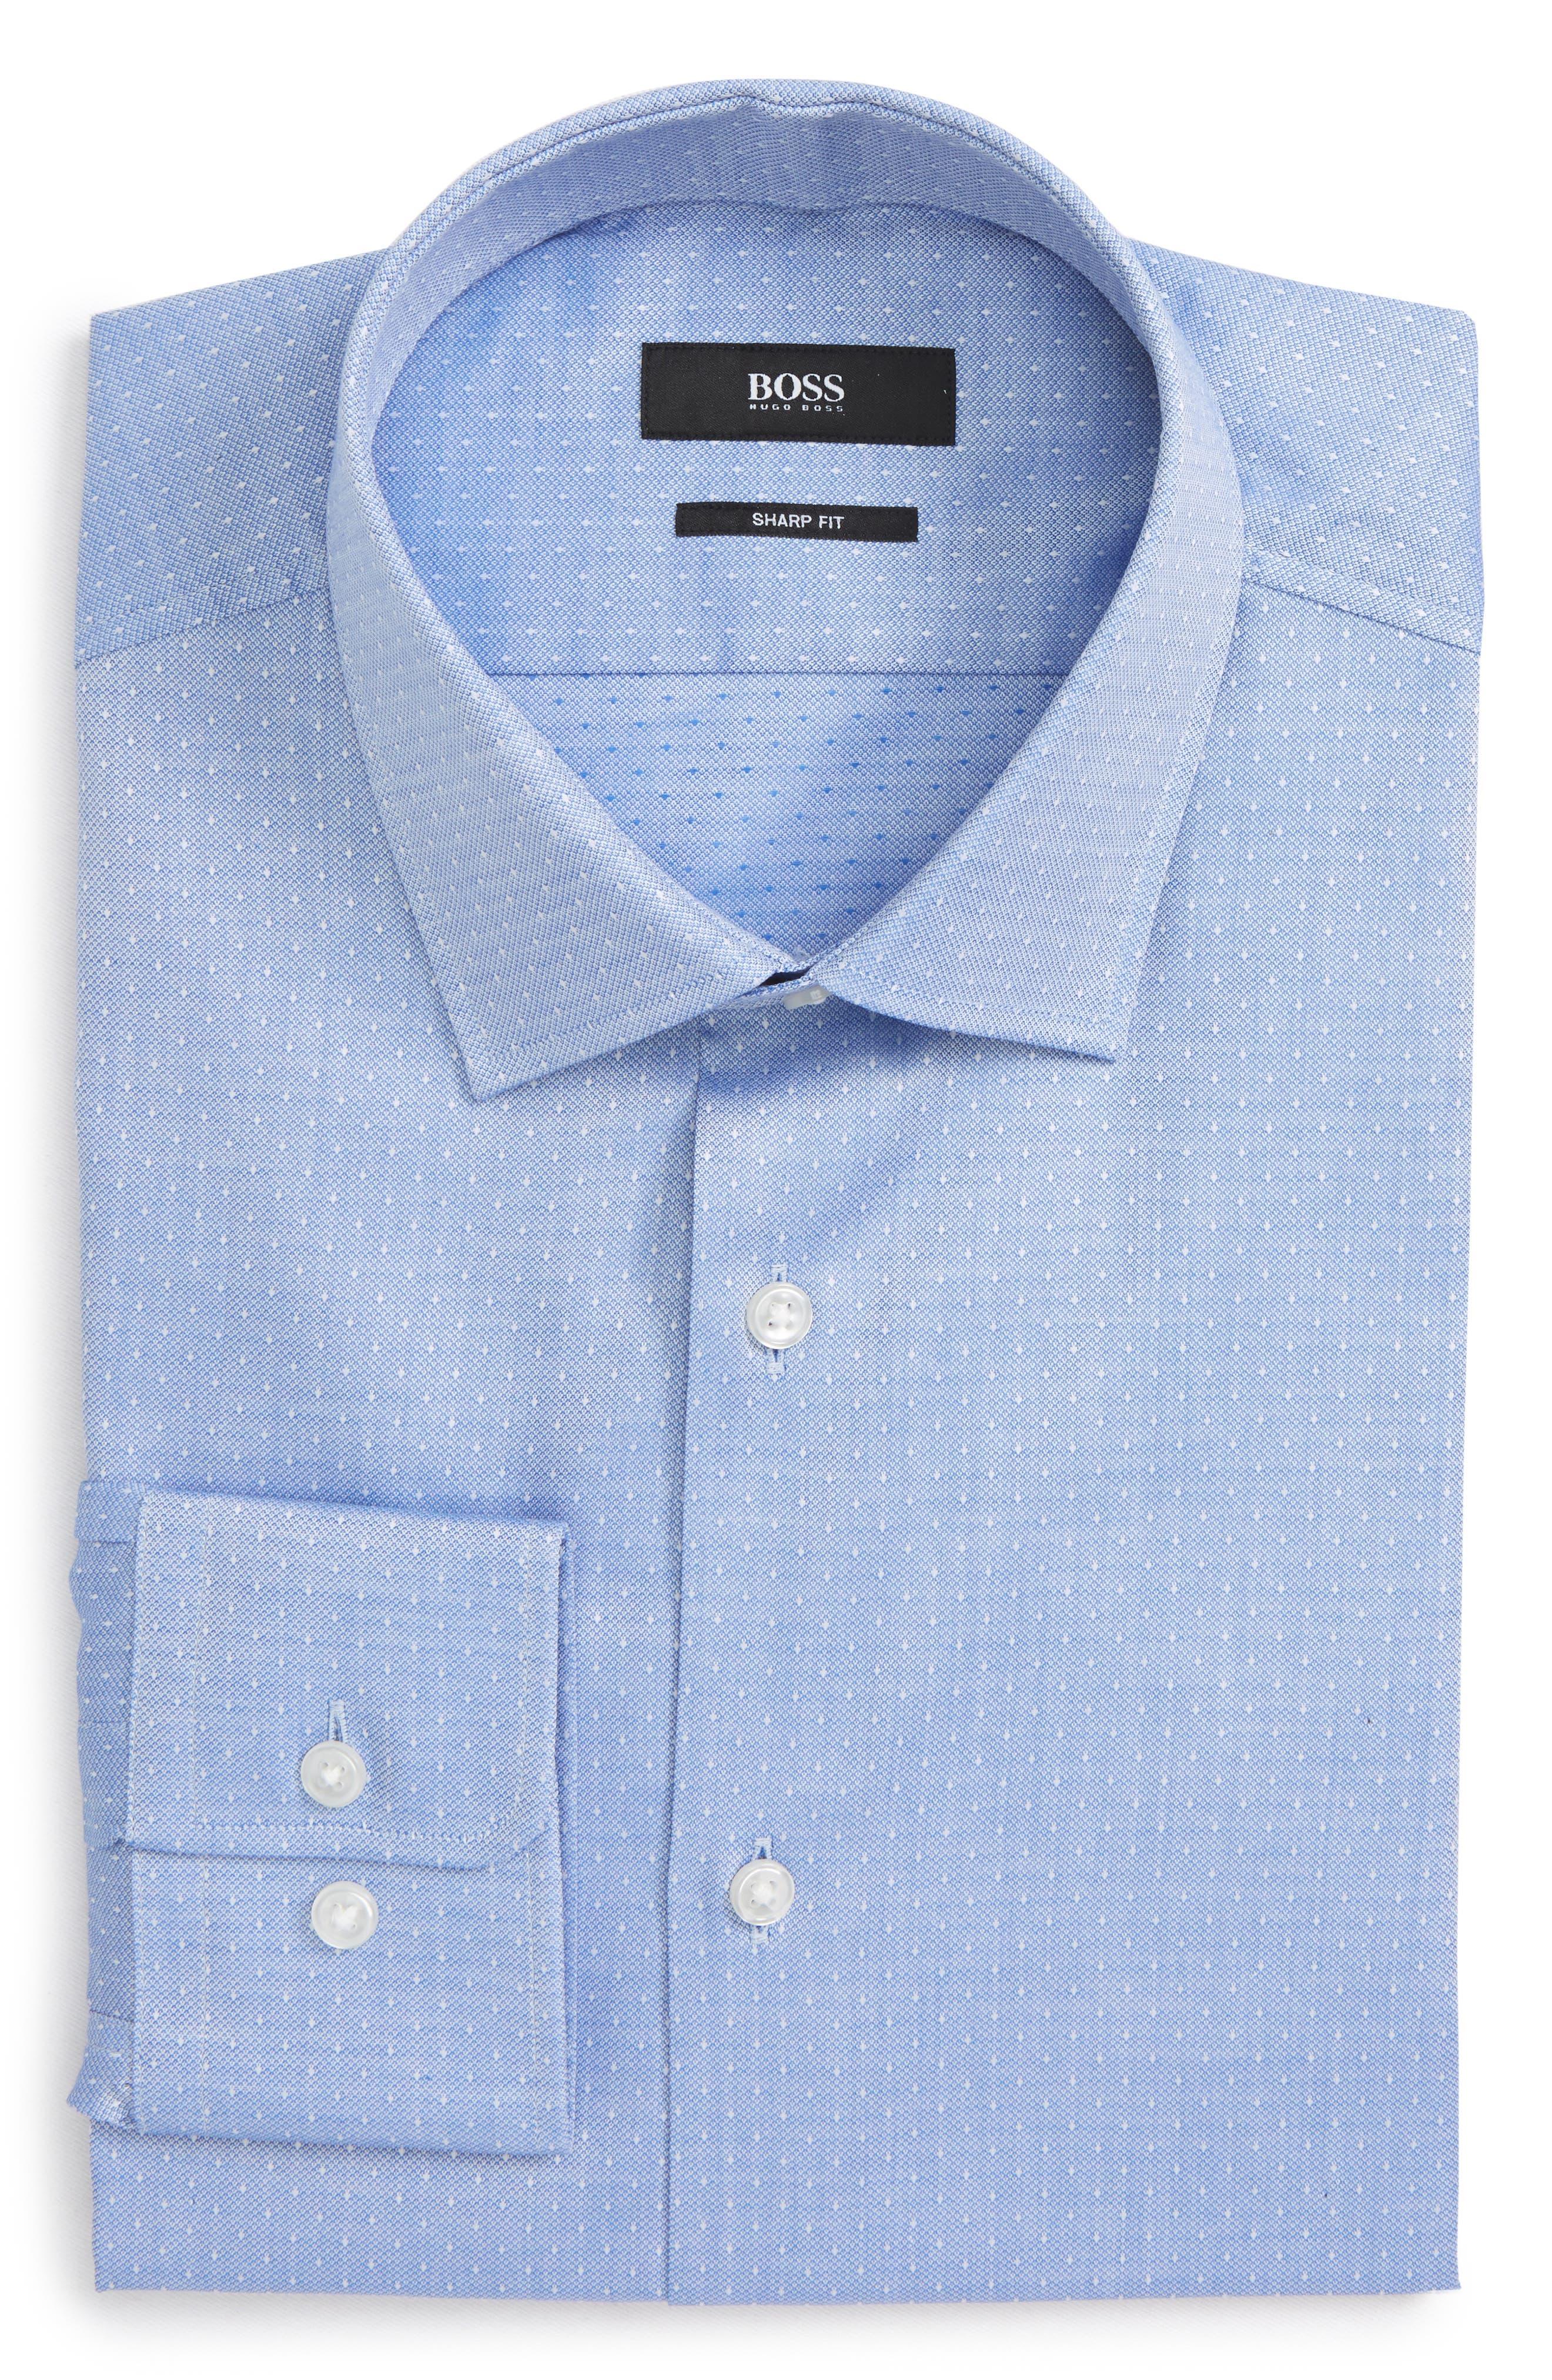 Mark Sharp Fit Dress Shirt,                             Main thumbnail 1, color,                             430